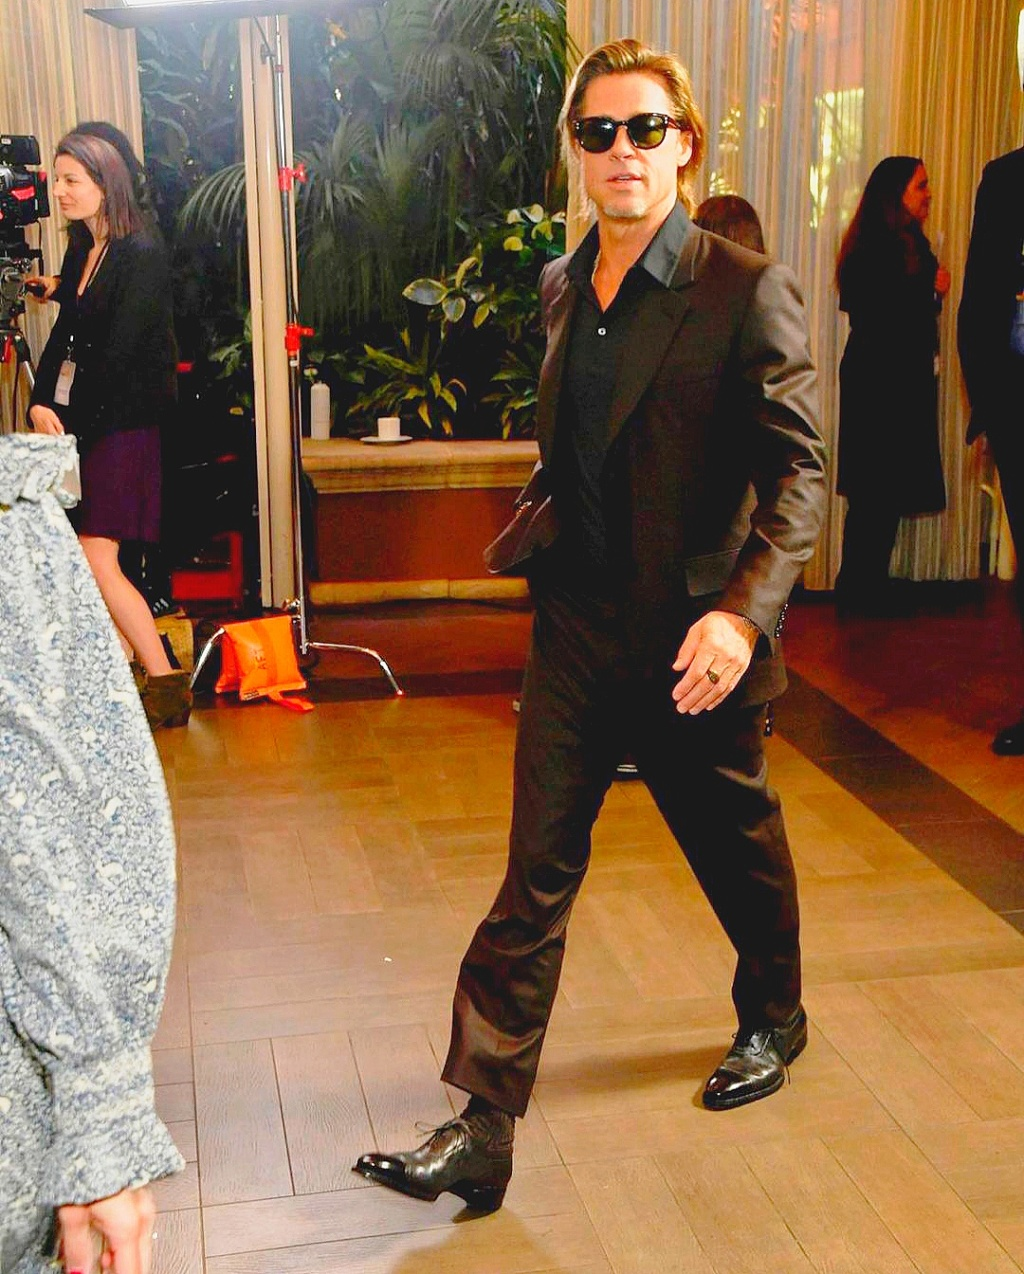 ¿Cuánto mide Brad Pitt? - Altura - Real height - Página 14 Img_2046